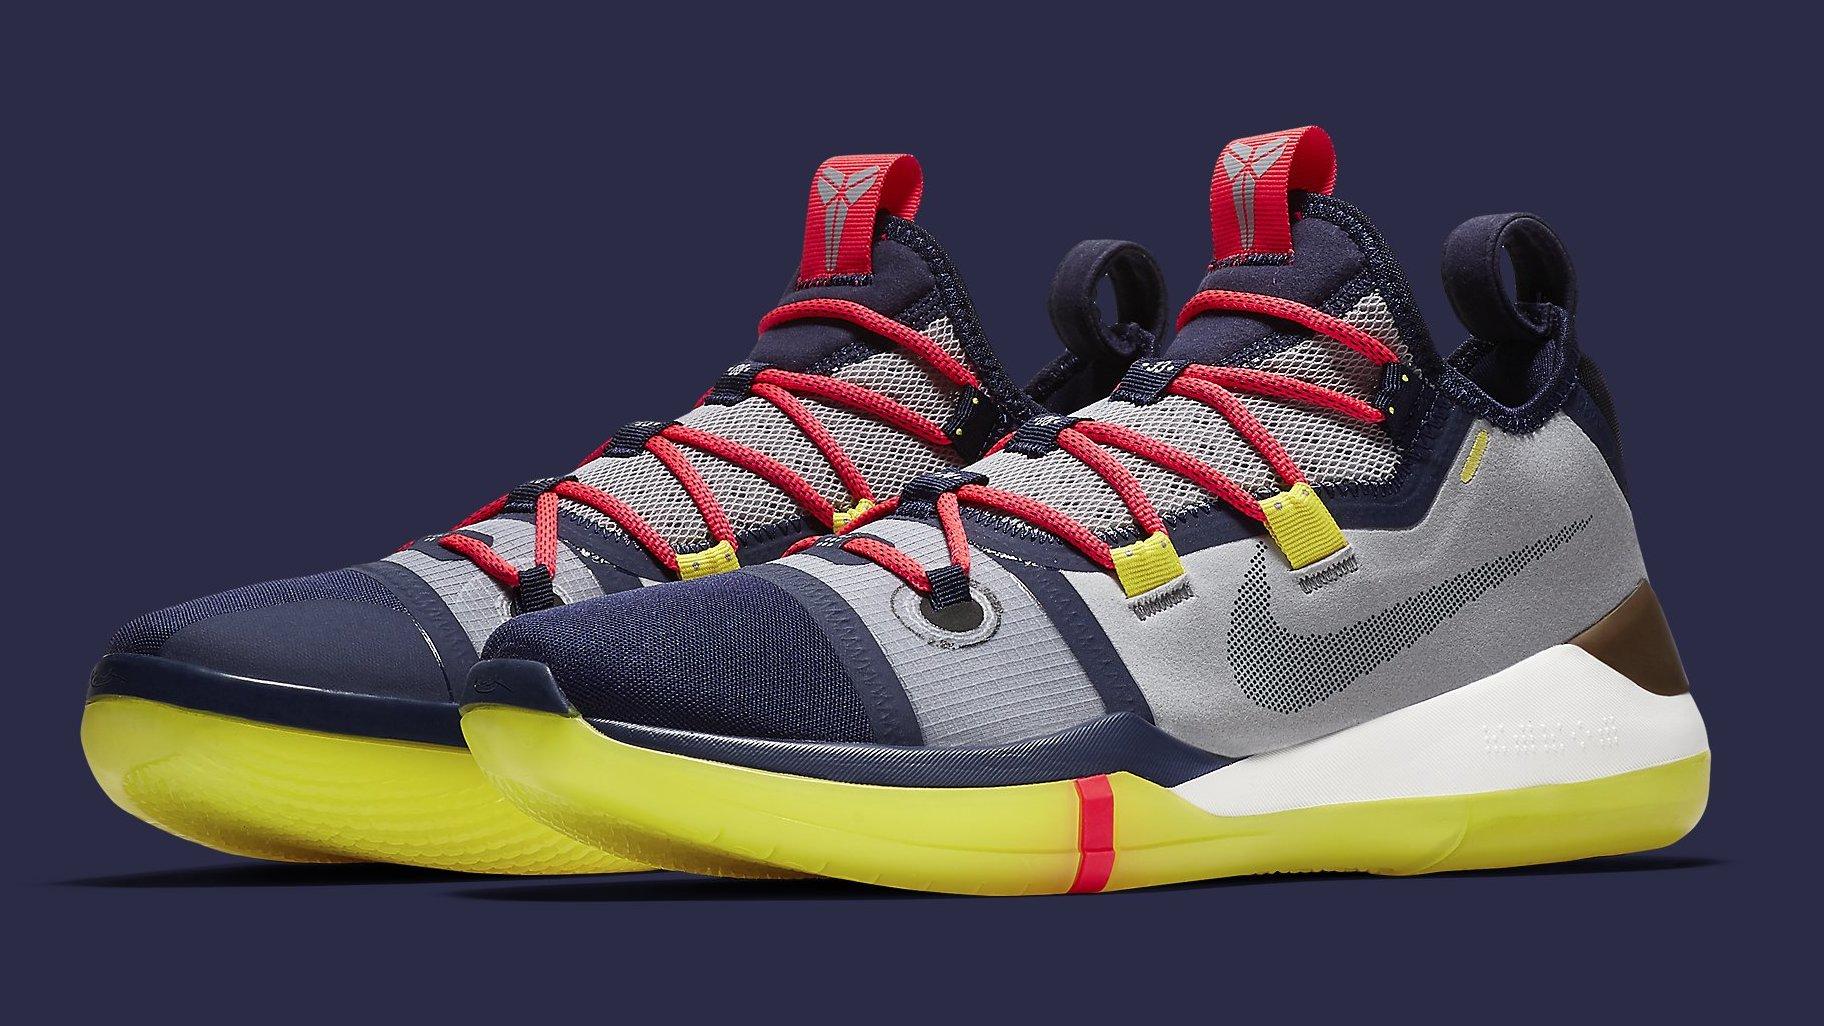 cbce9fc4df37 Nike Kobe A.D. Release Date Aug. 24